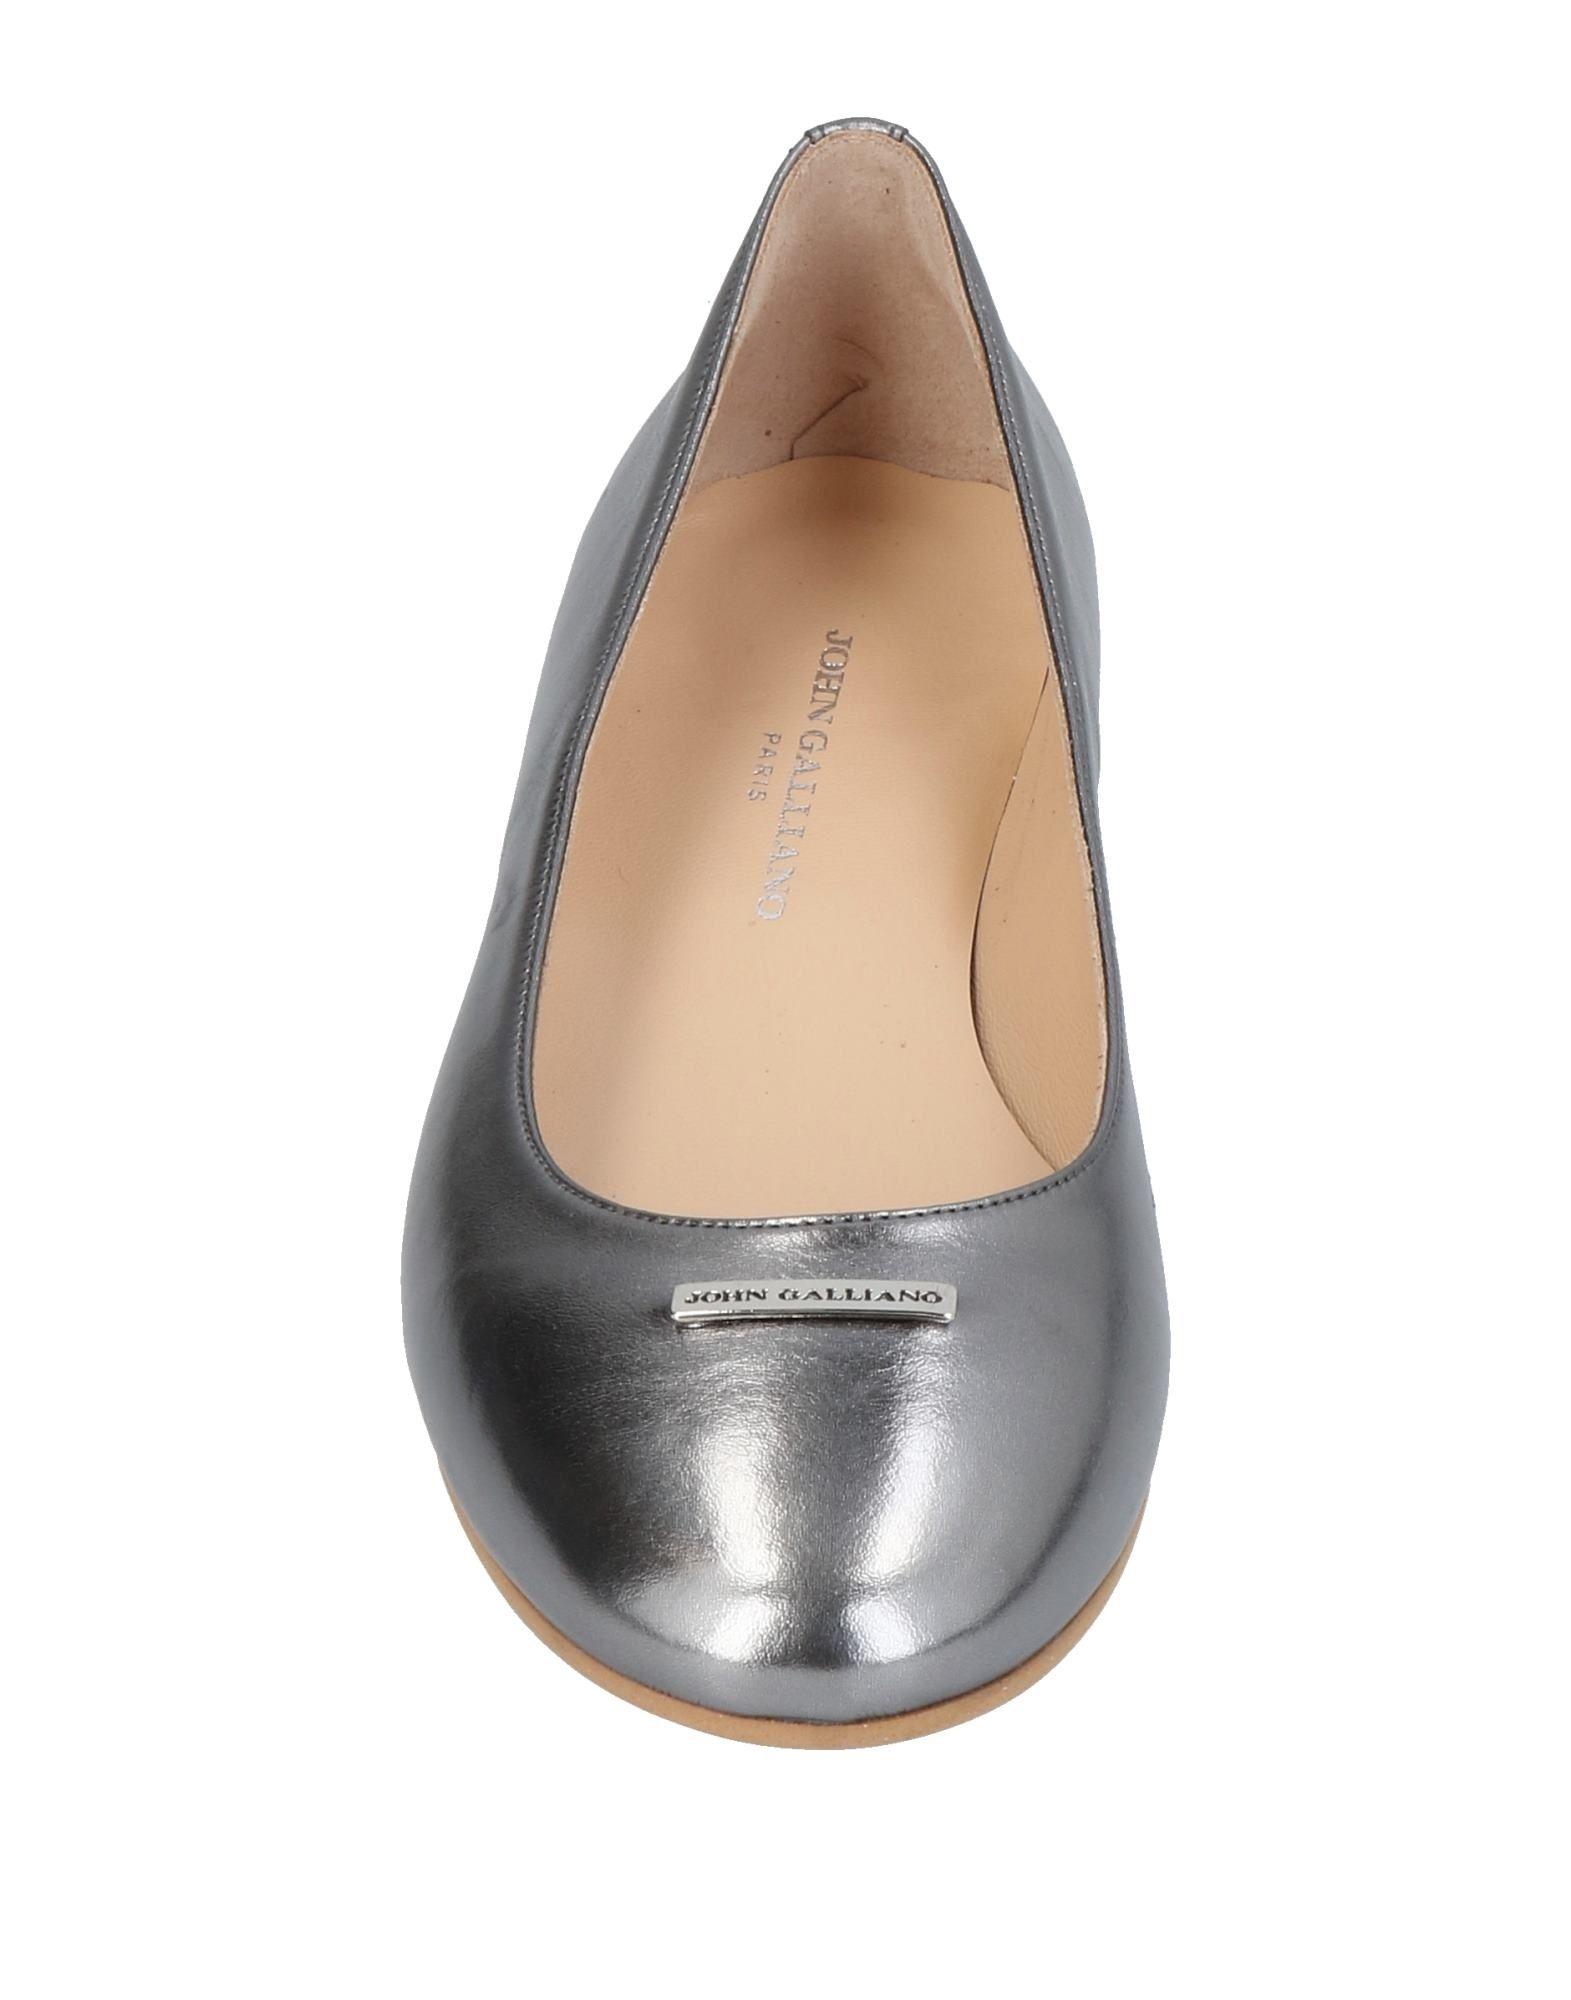 Stilvolle Ballerinas billige Schuhe John Galliano Ballerinas Stilvolle Damen  11426457HE f7d52f